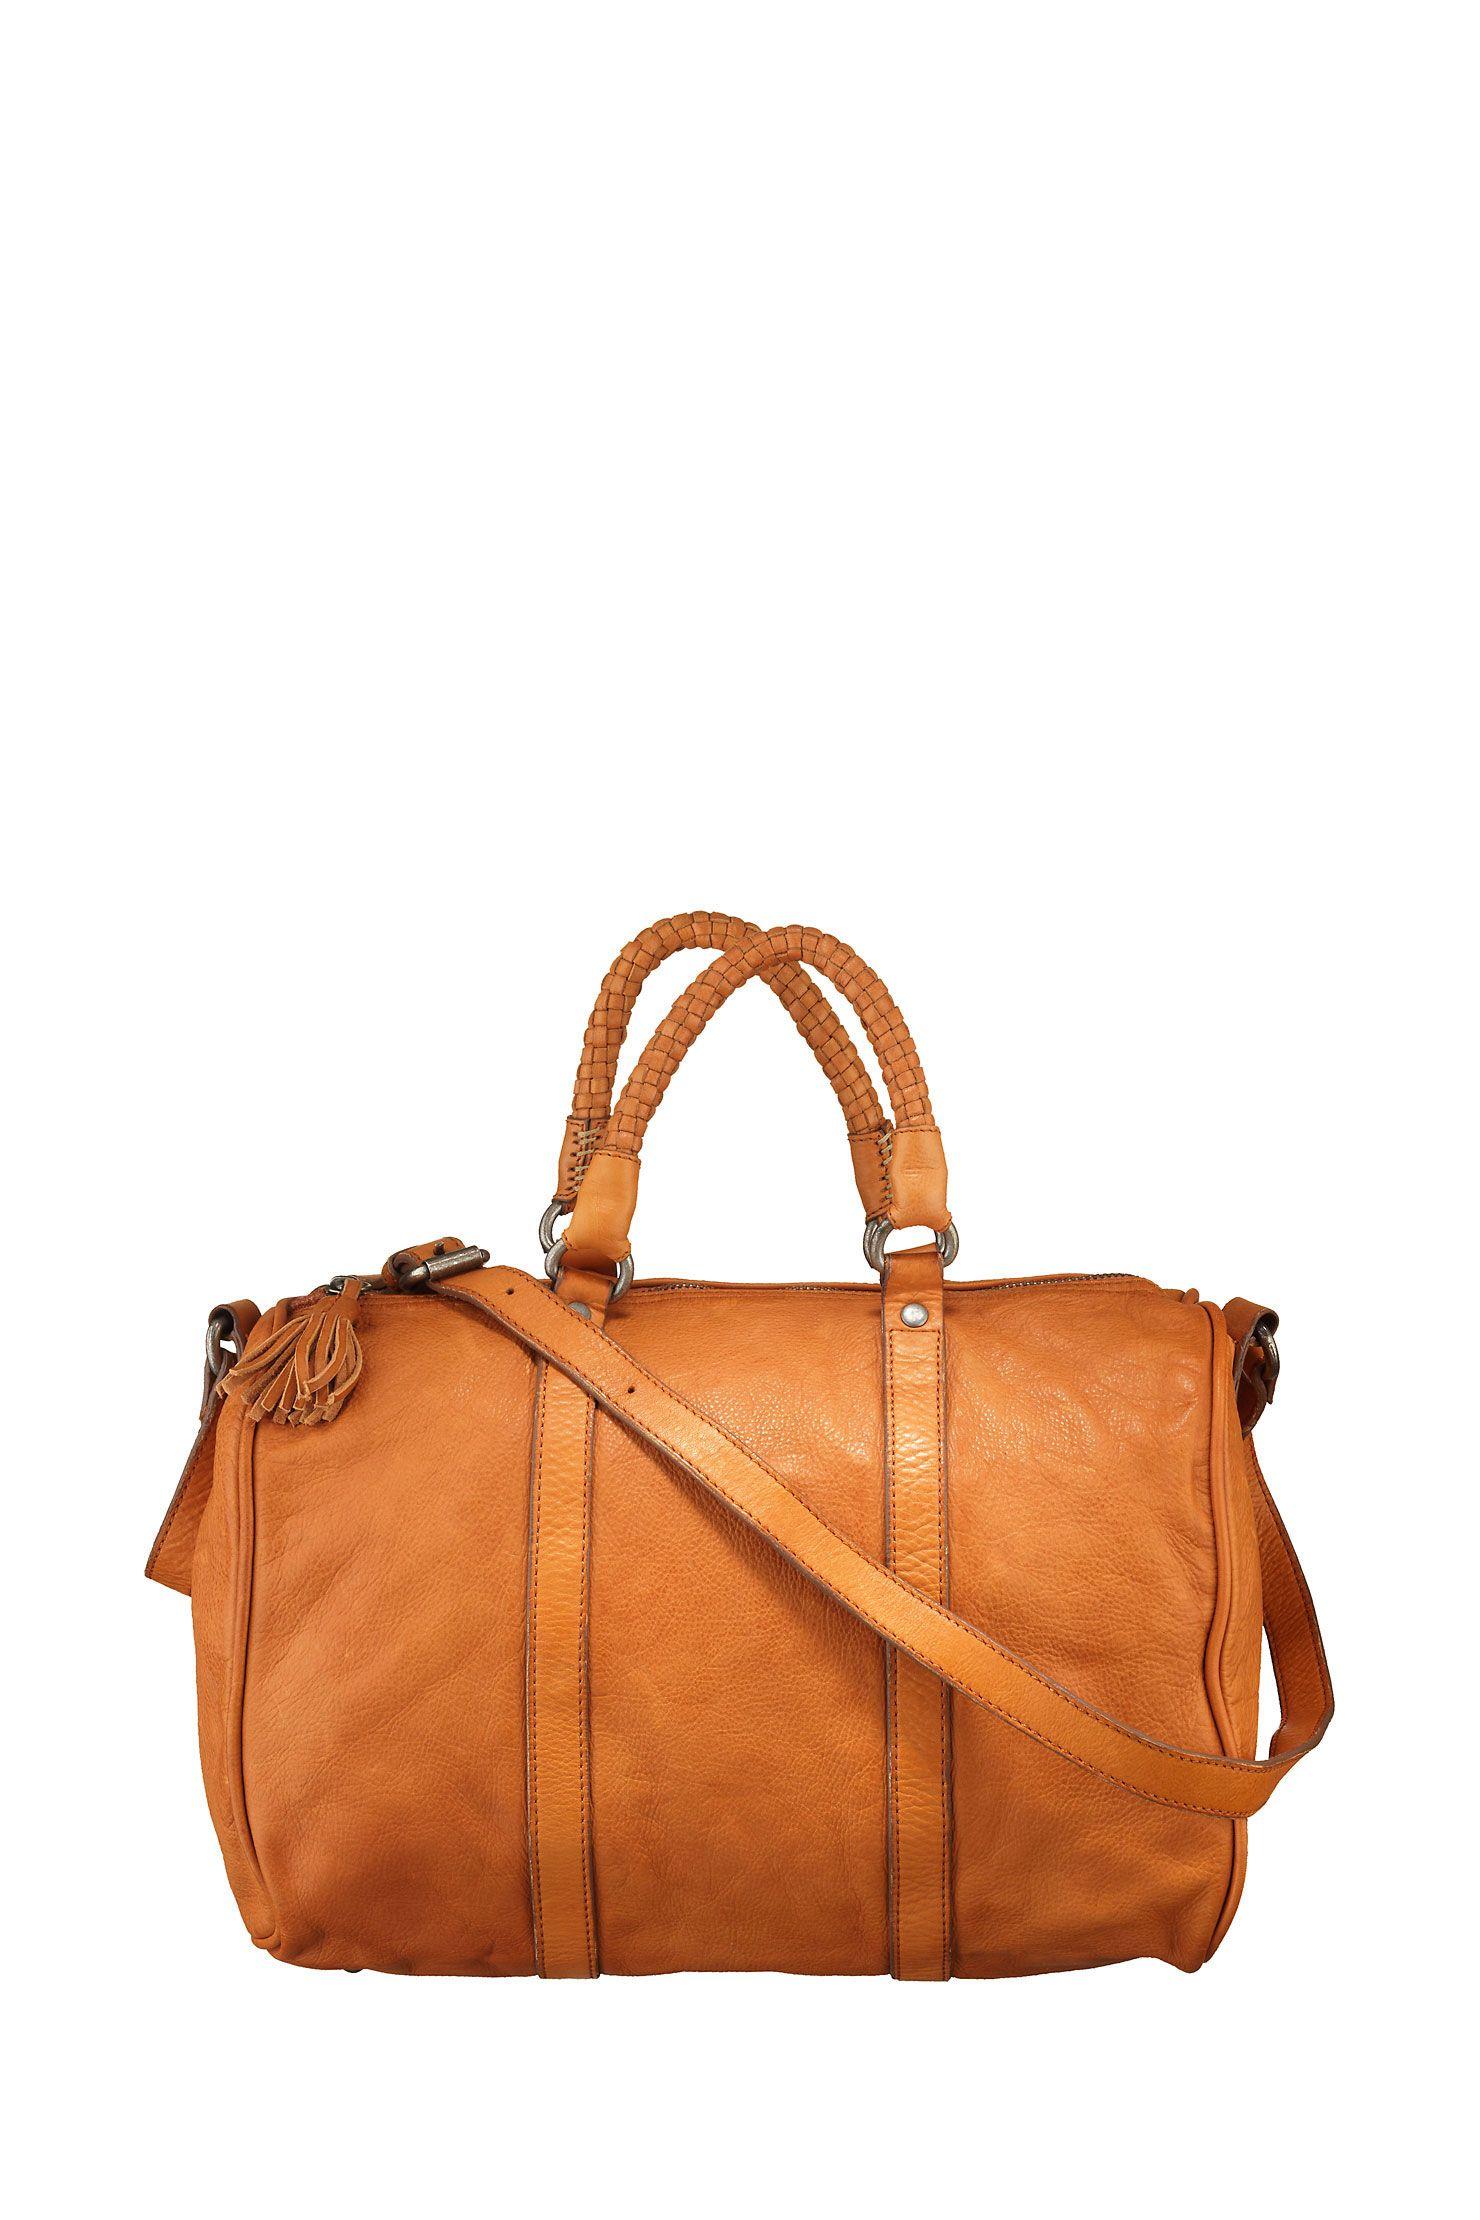 Sac en cuir camel ikks women uac bags pinterest ethnic bag